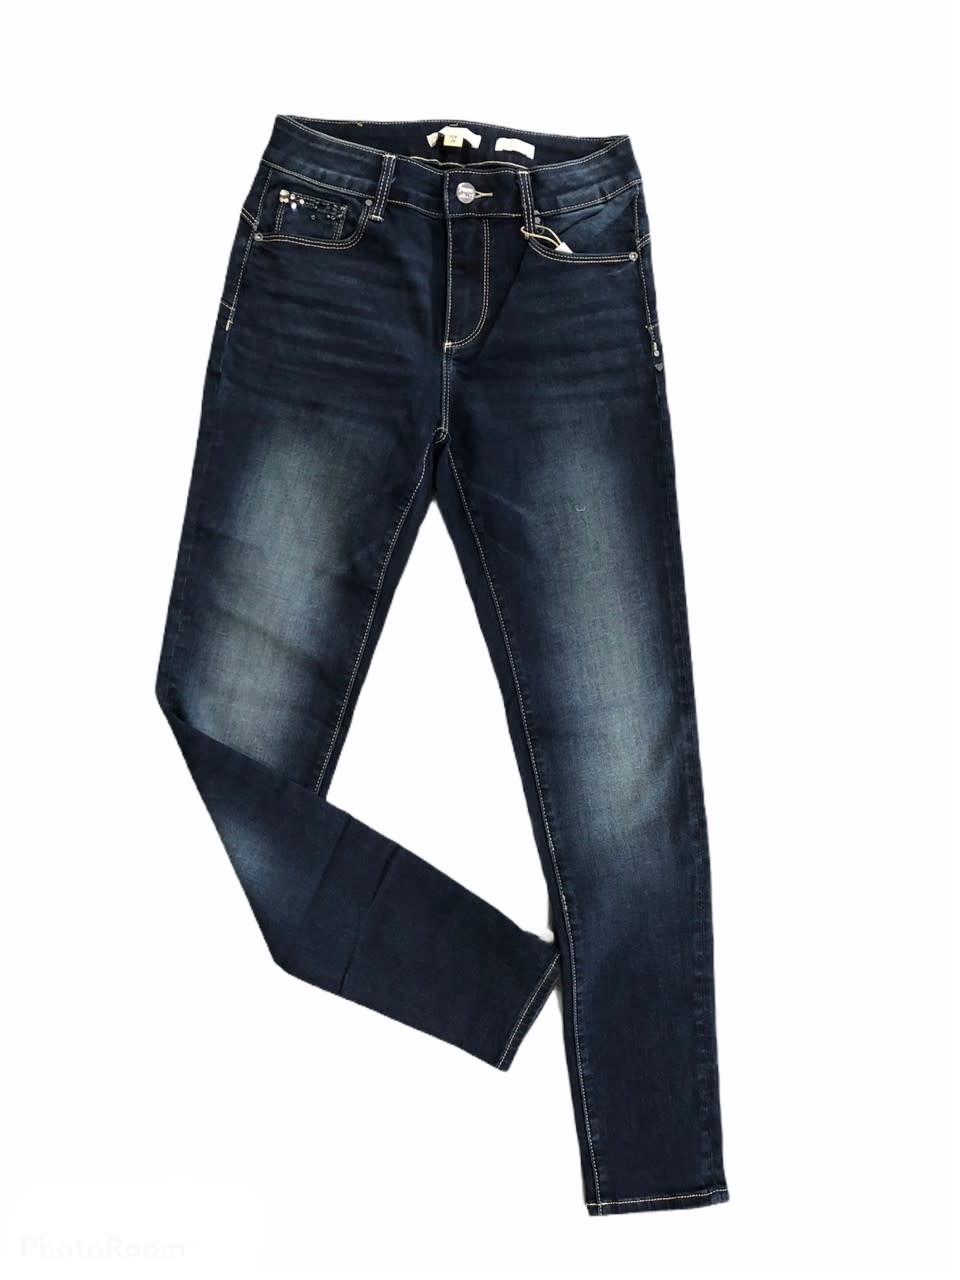 Fracomina A/W Jeans Pants Dark Blue Fracomina